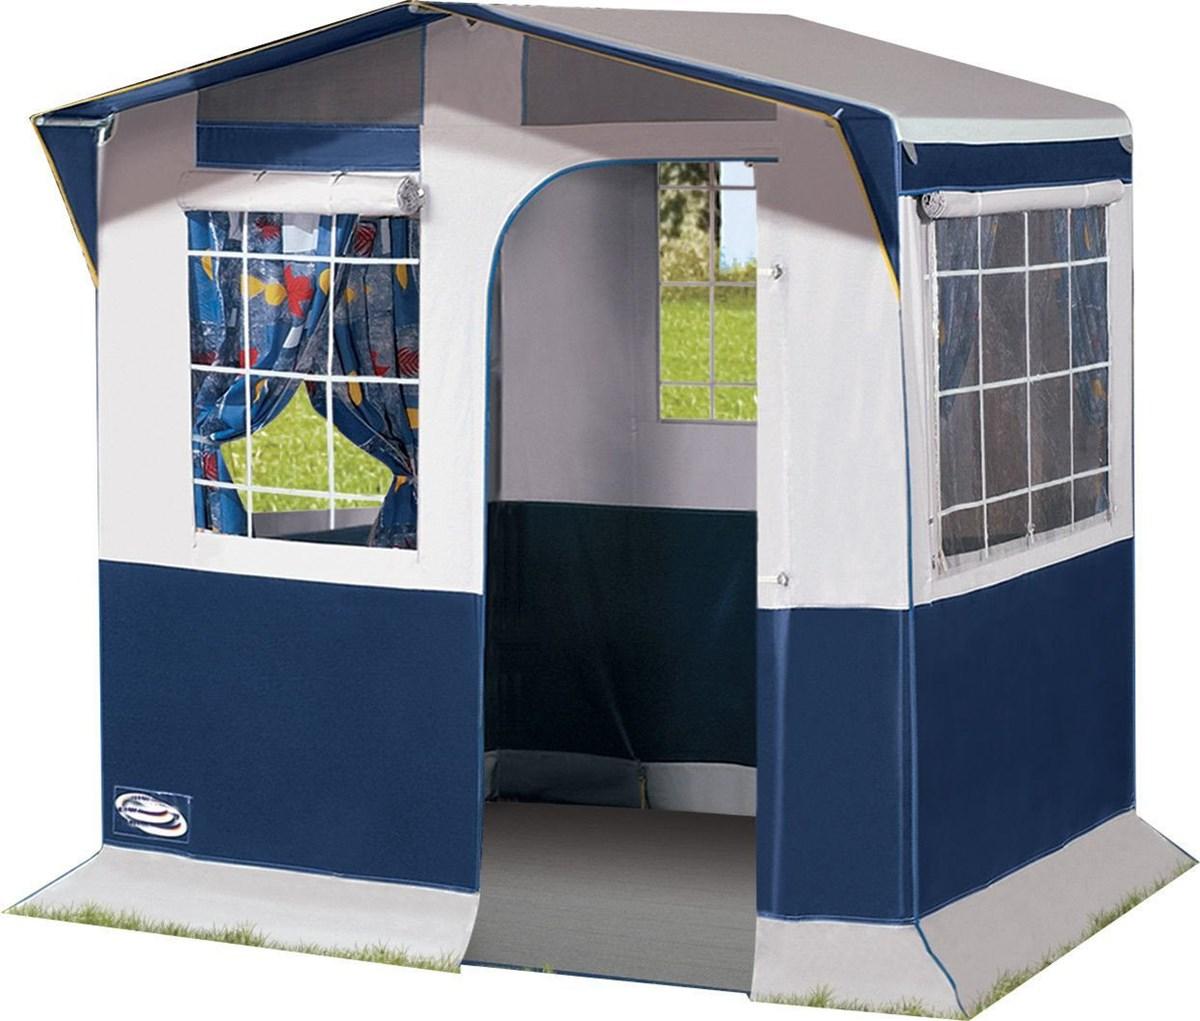 Large Kitchen Utility Tent  sc 1 st  Savvysurf & Large Kitchen Utility Tent - savvysurf.co.uk